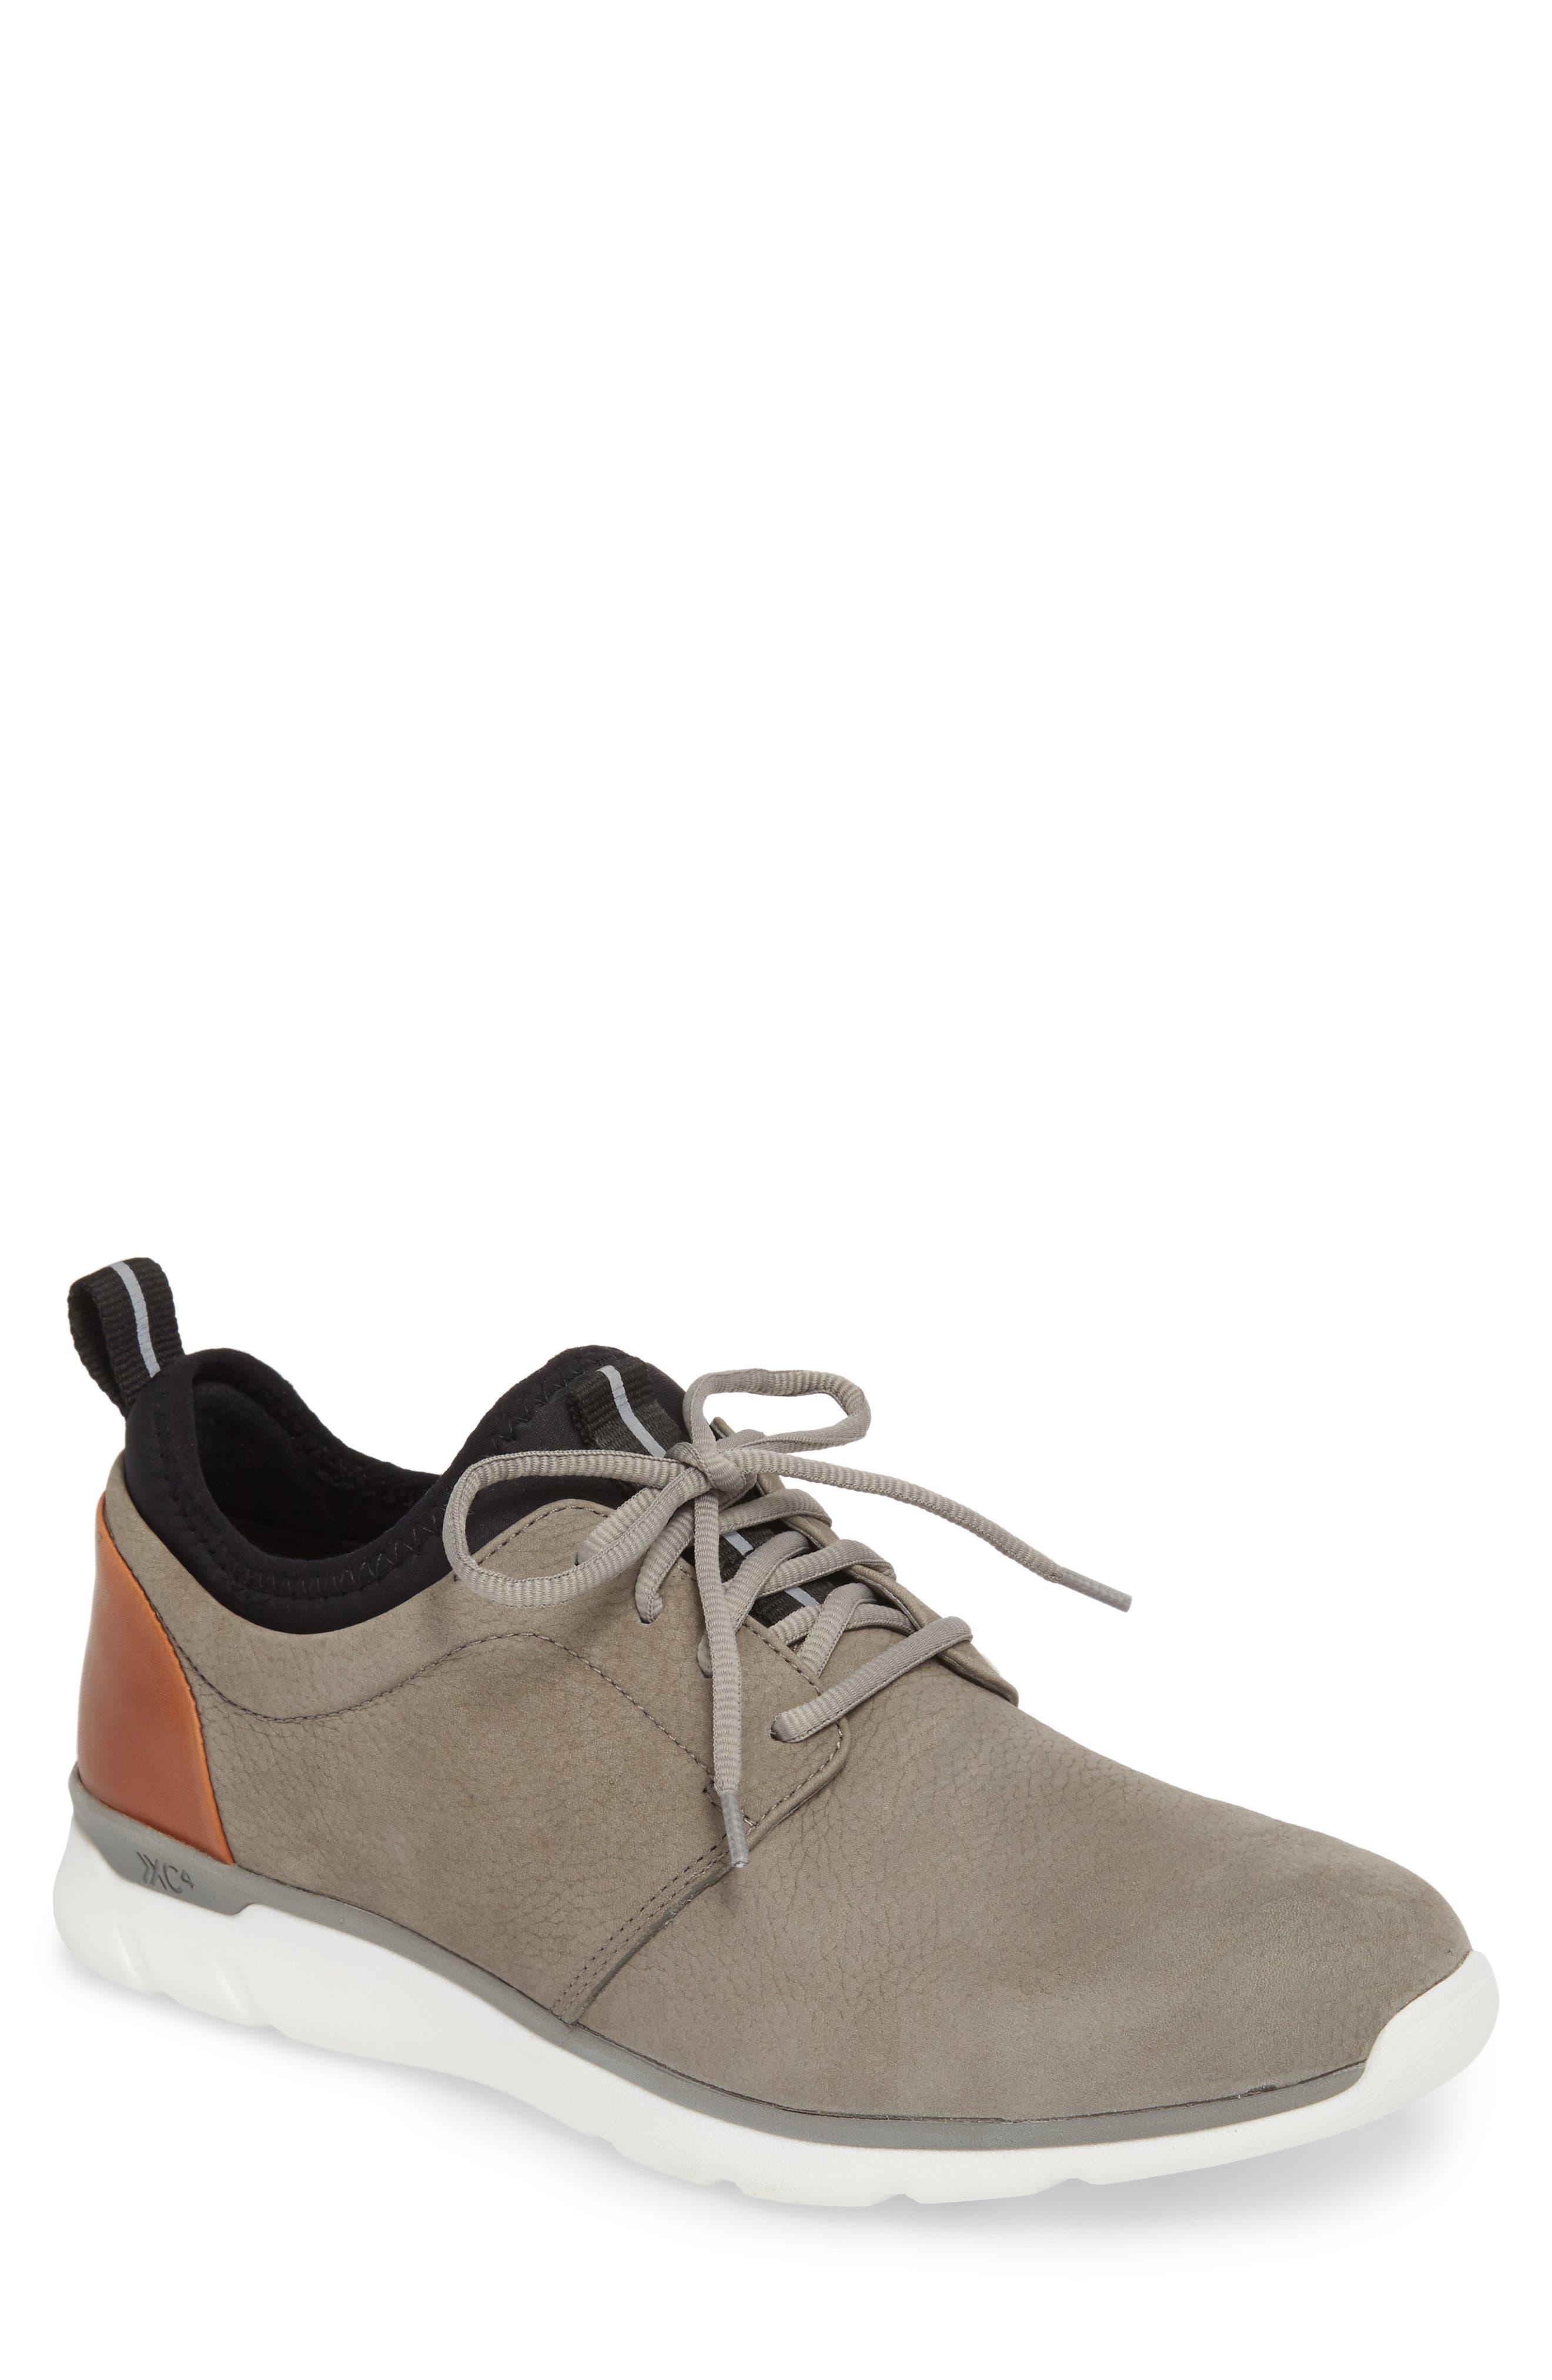 Prentiss Xc4 Waterproof Low Top Sneaker